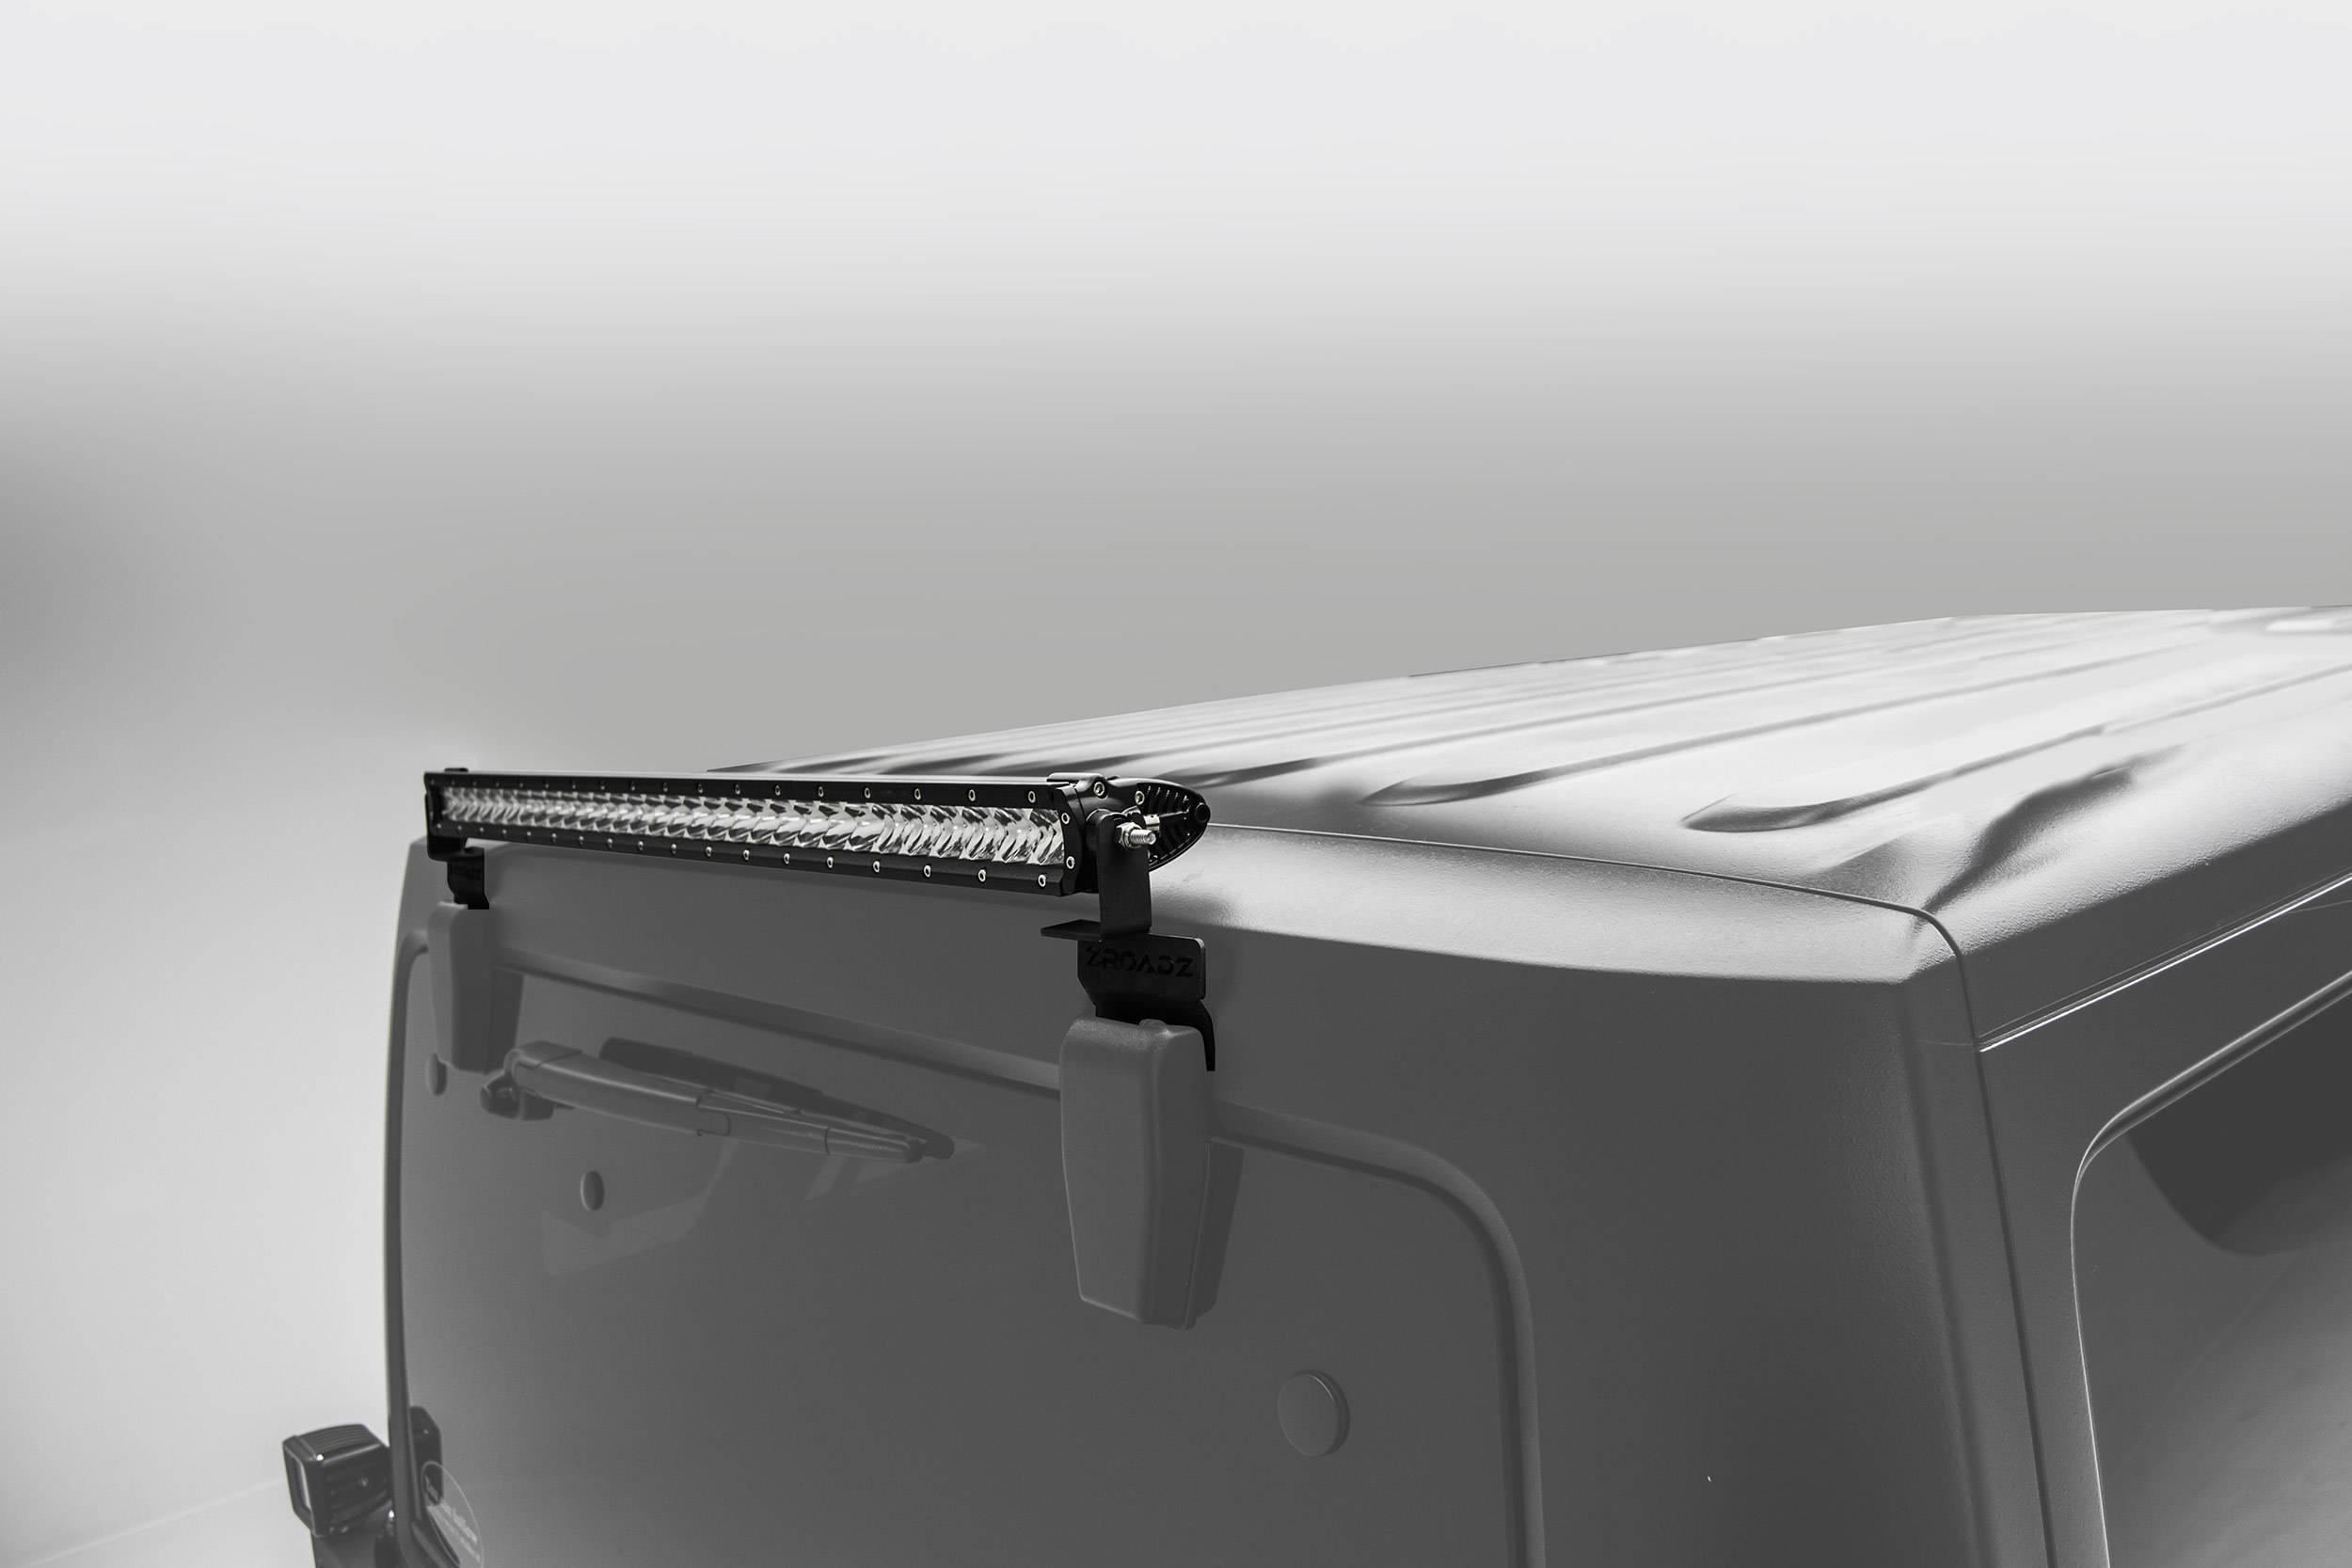 2007-2018 Jeep JK Rear Window LED Kit, Incl. (1) 30 Inch LED Straight Single Row Slim Light Bar - PN #Z394811-KIT